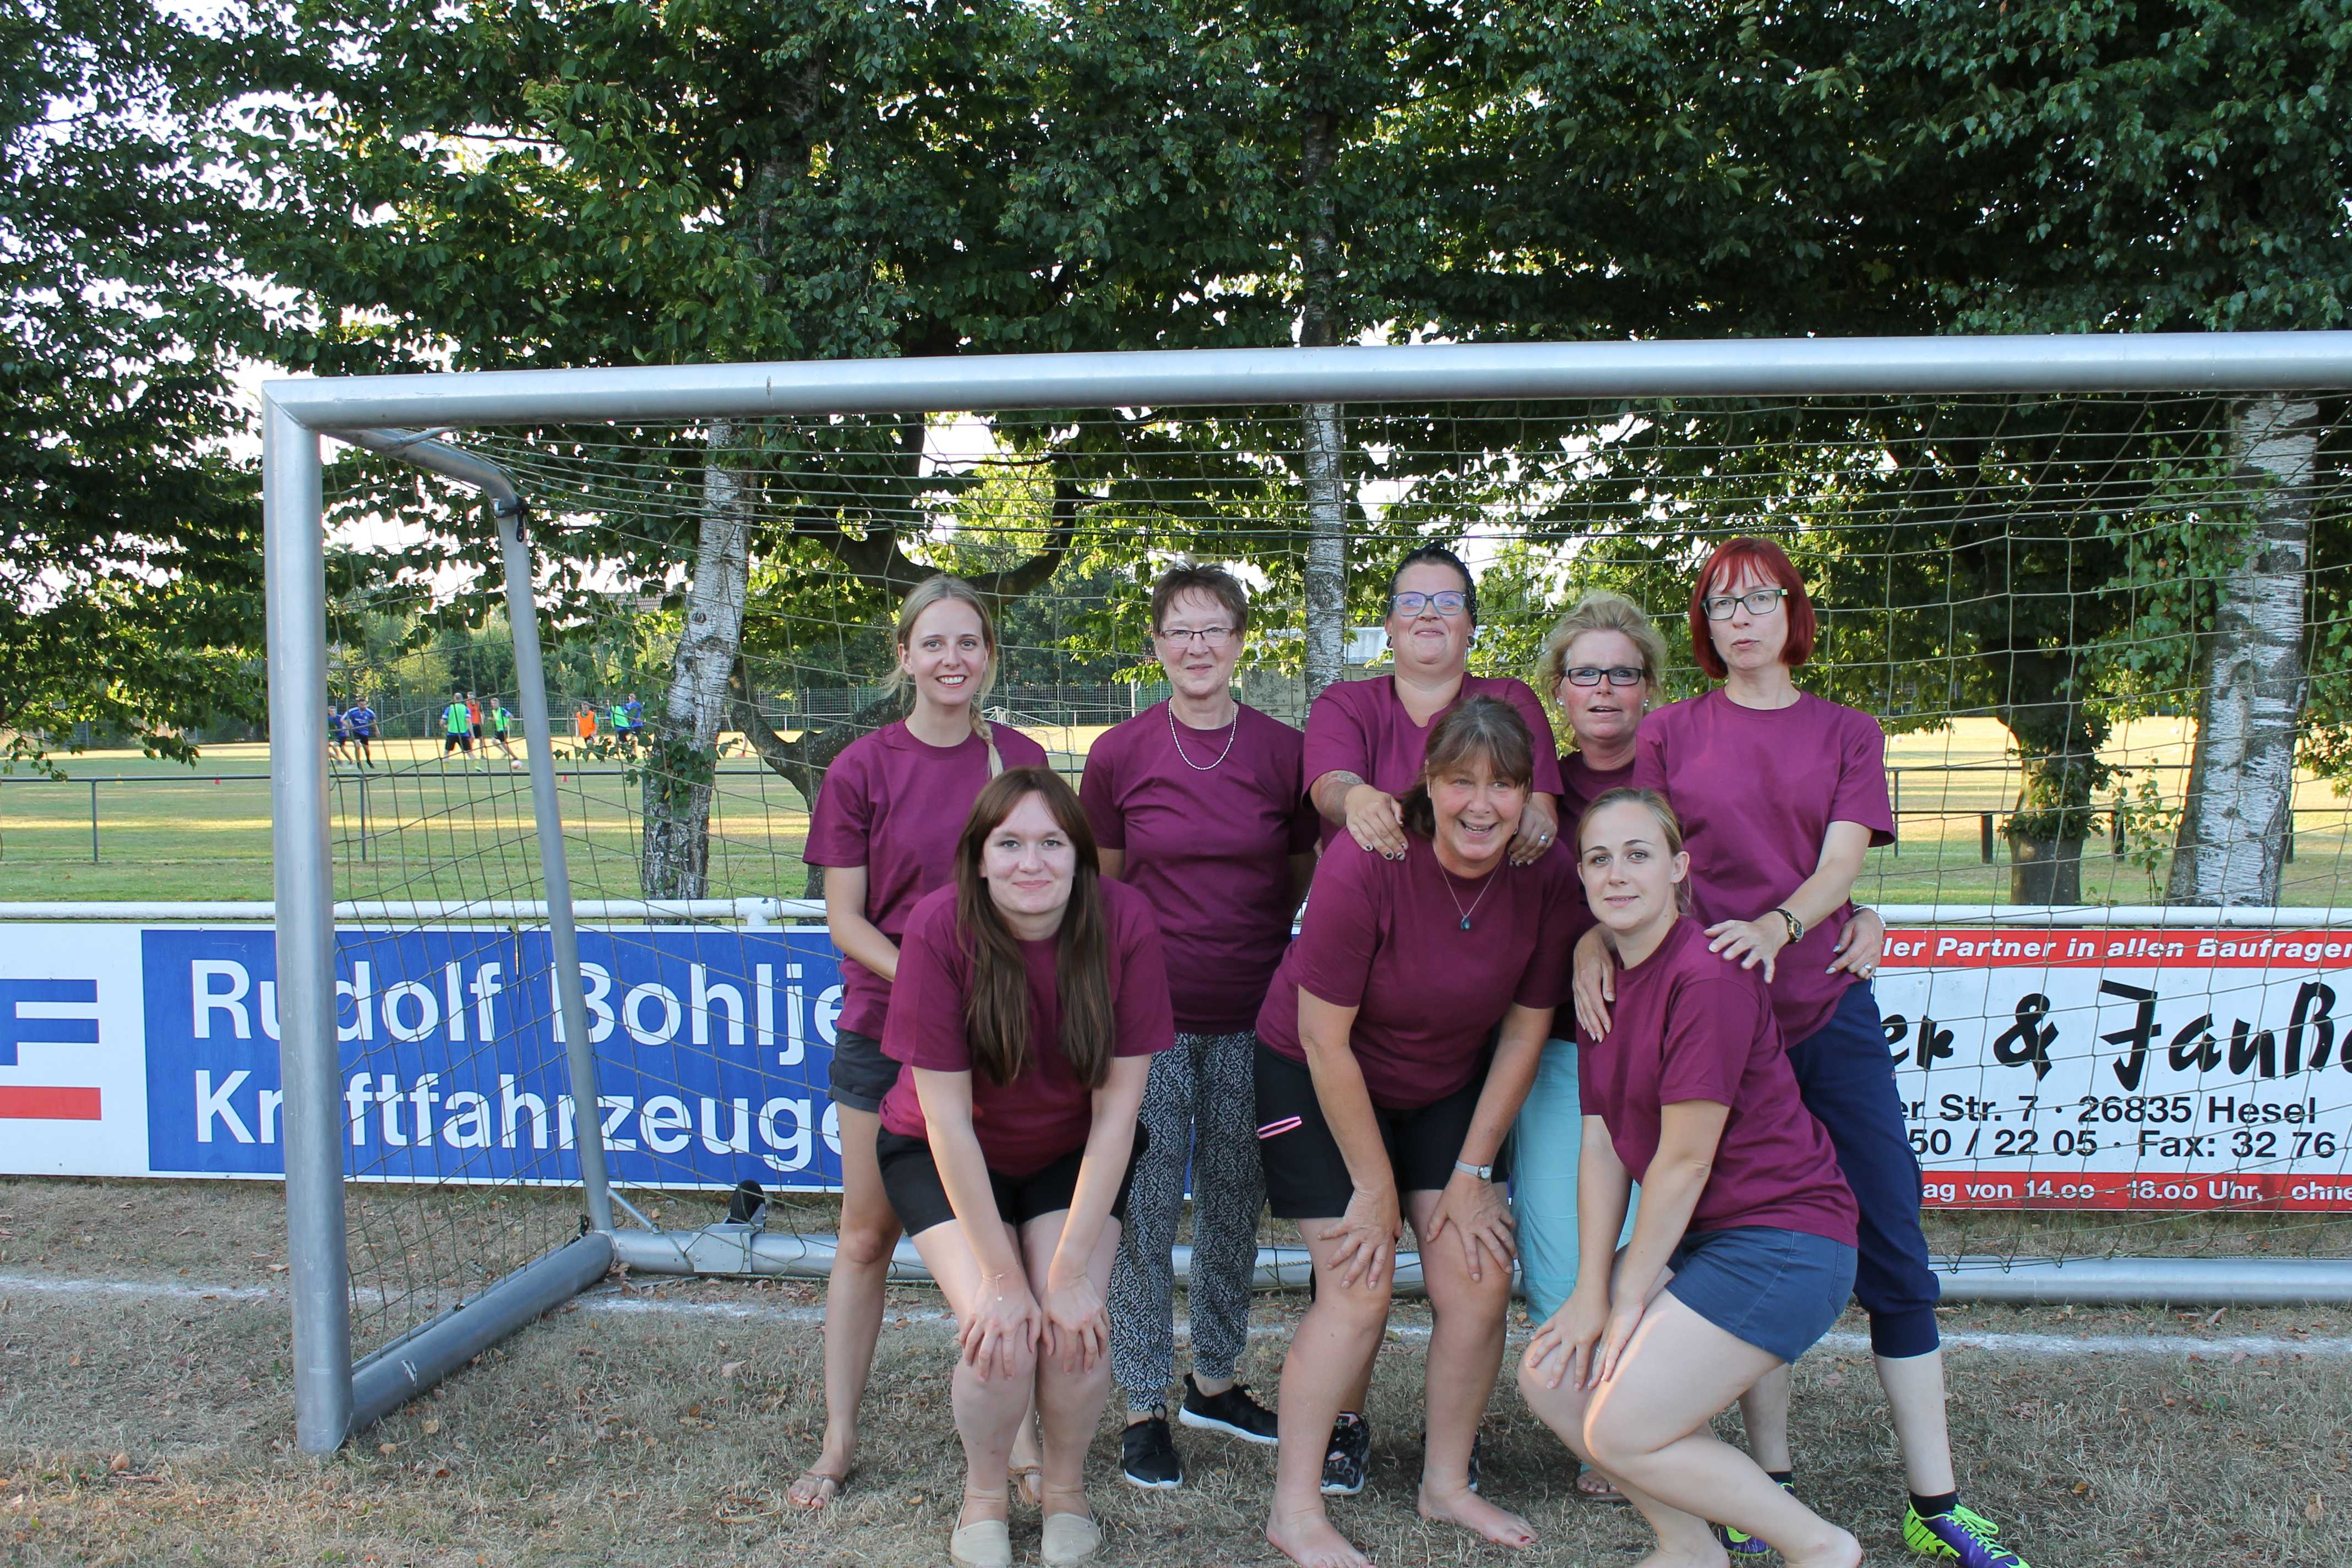 2018-07-27 Sportwoche - Flunkyball Turnier (39)